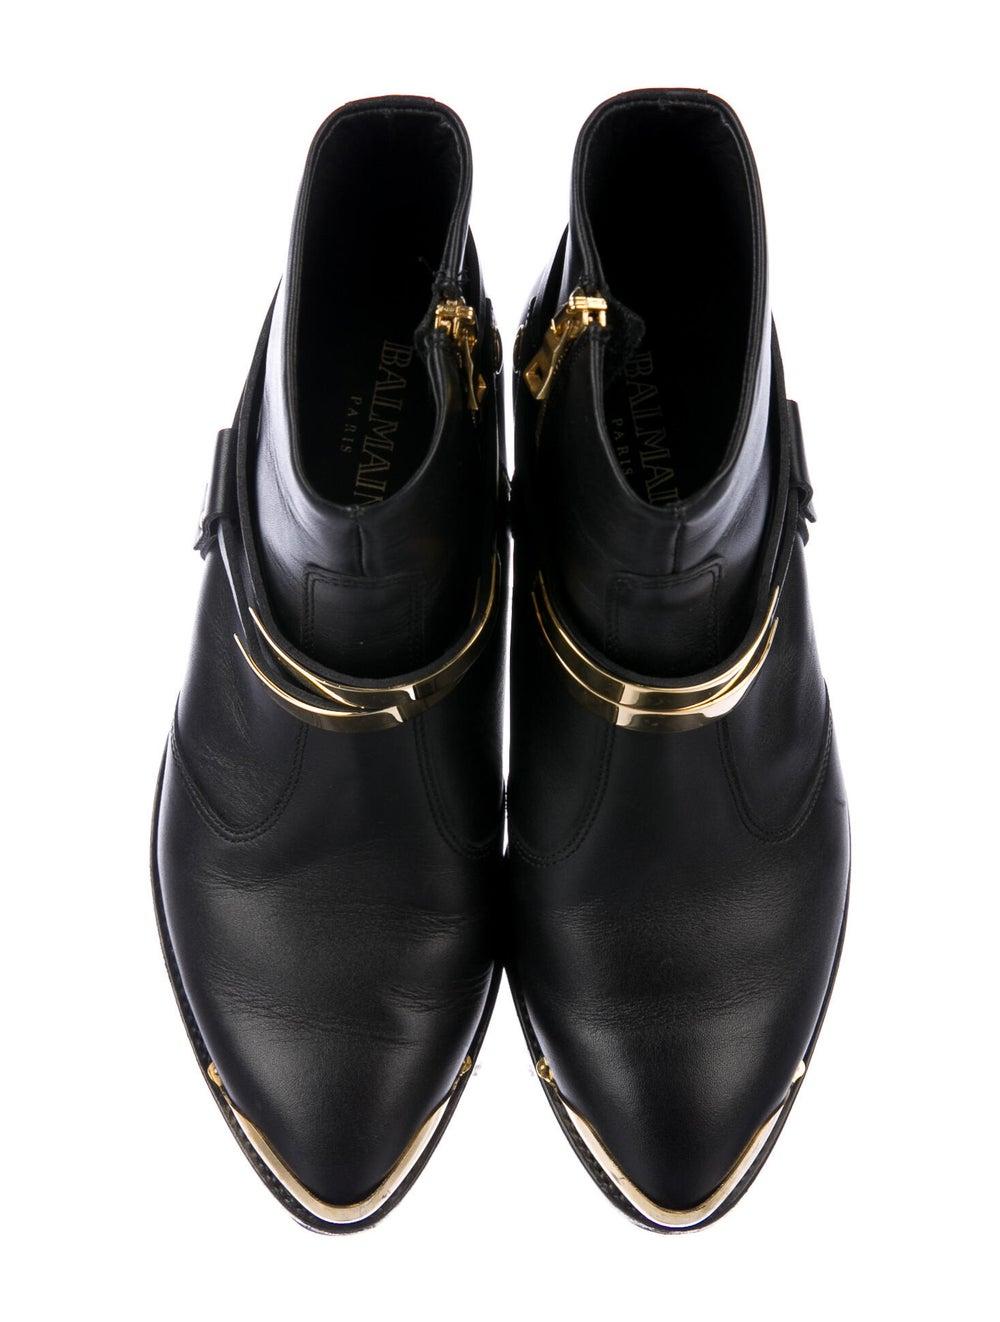 Balmain Leather Western Boots Black - image 3